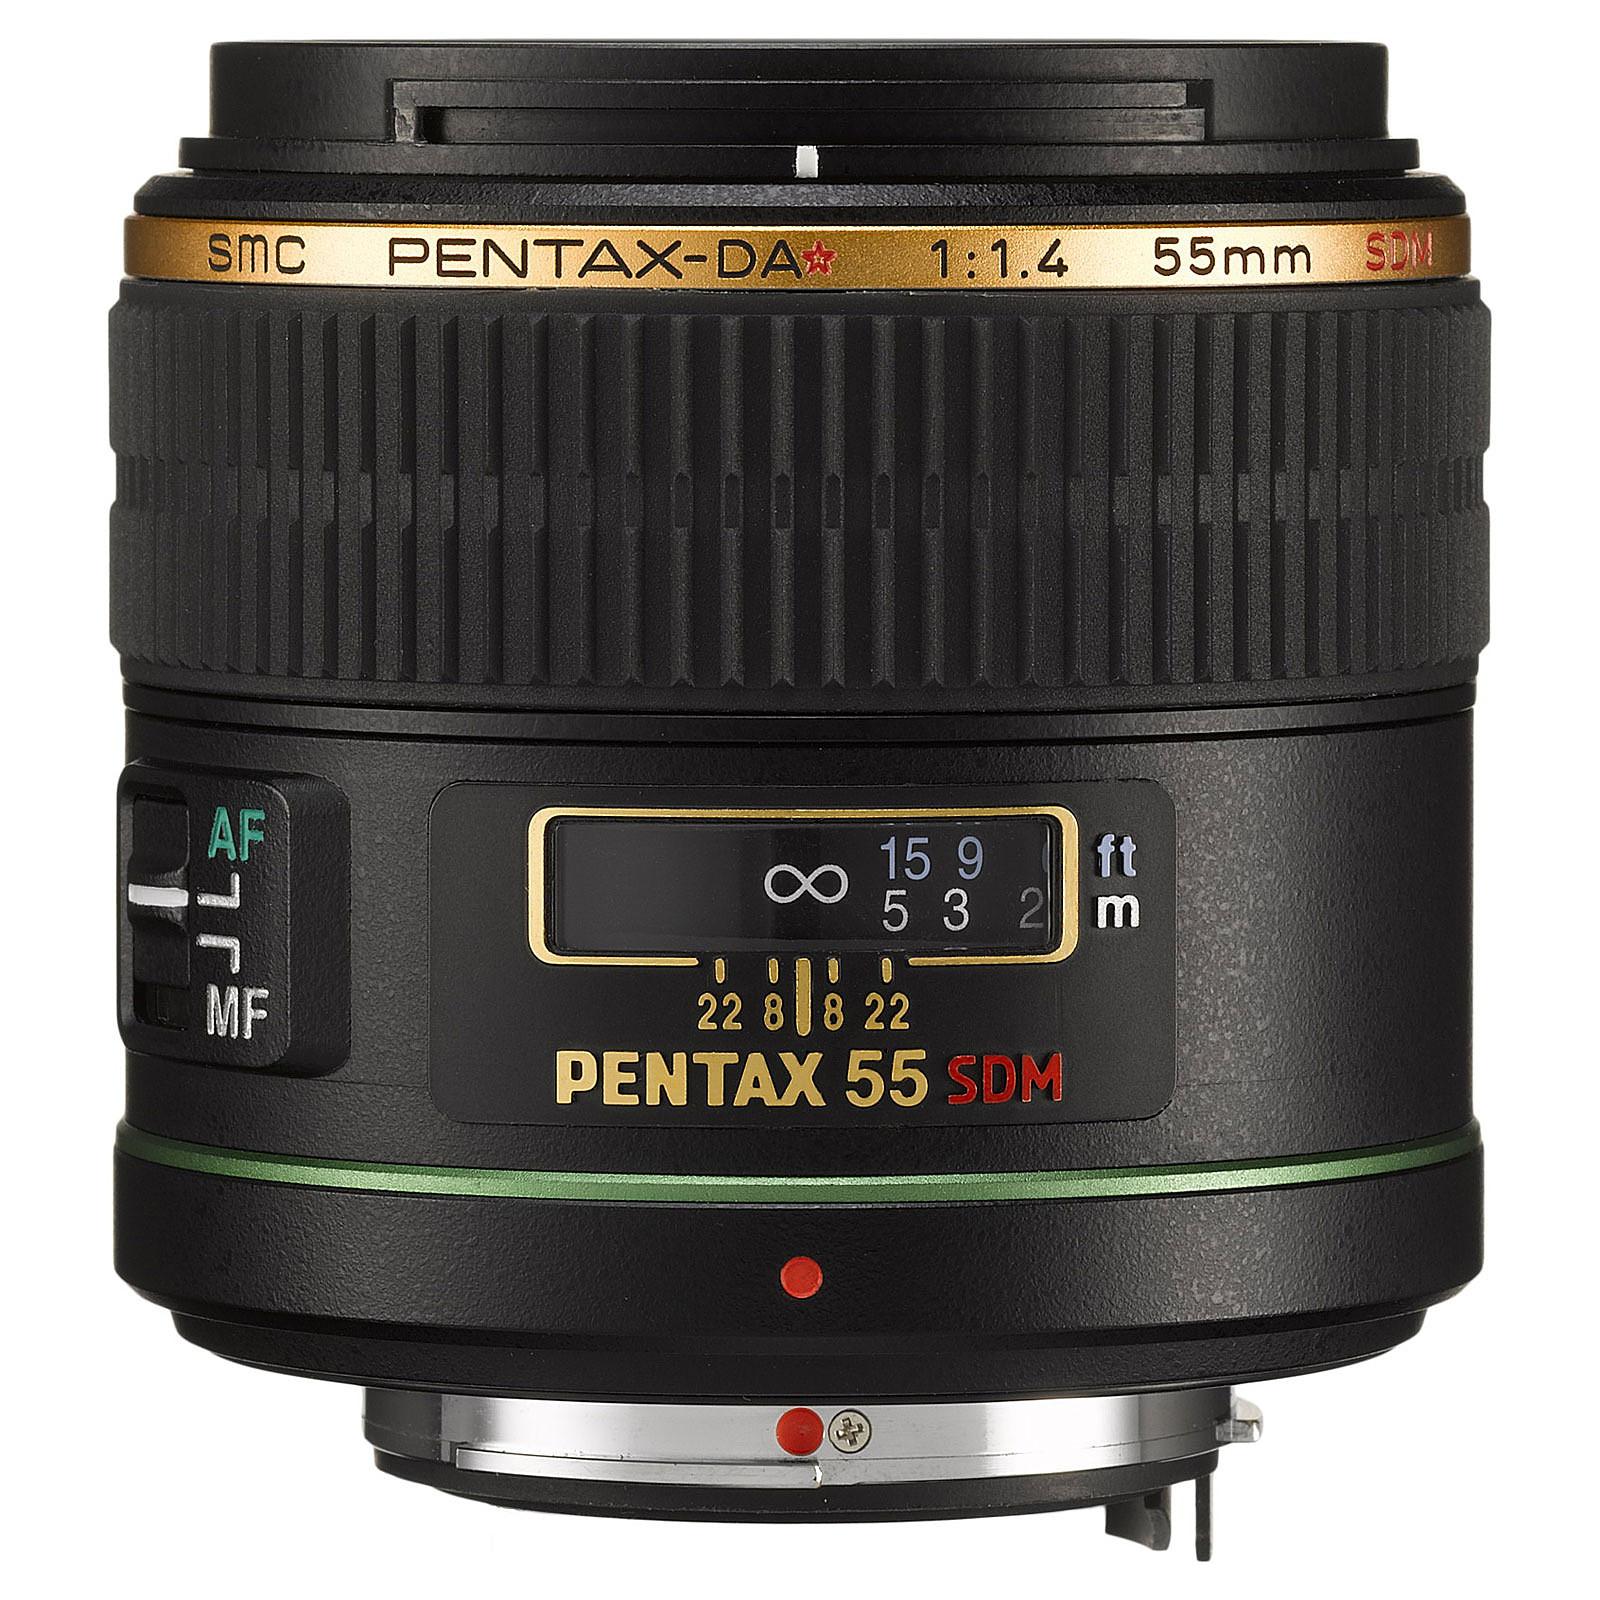 Pentax DA* 55mm f/1,4 SDM